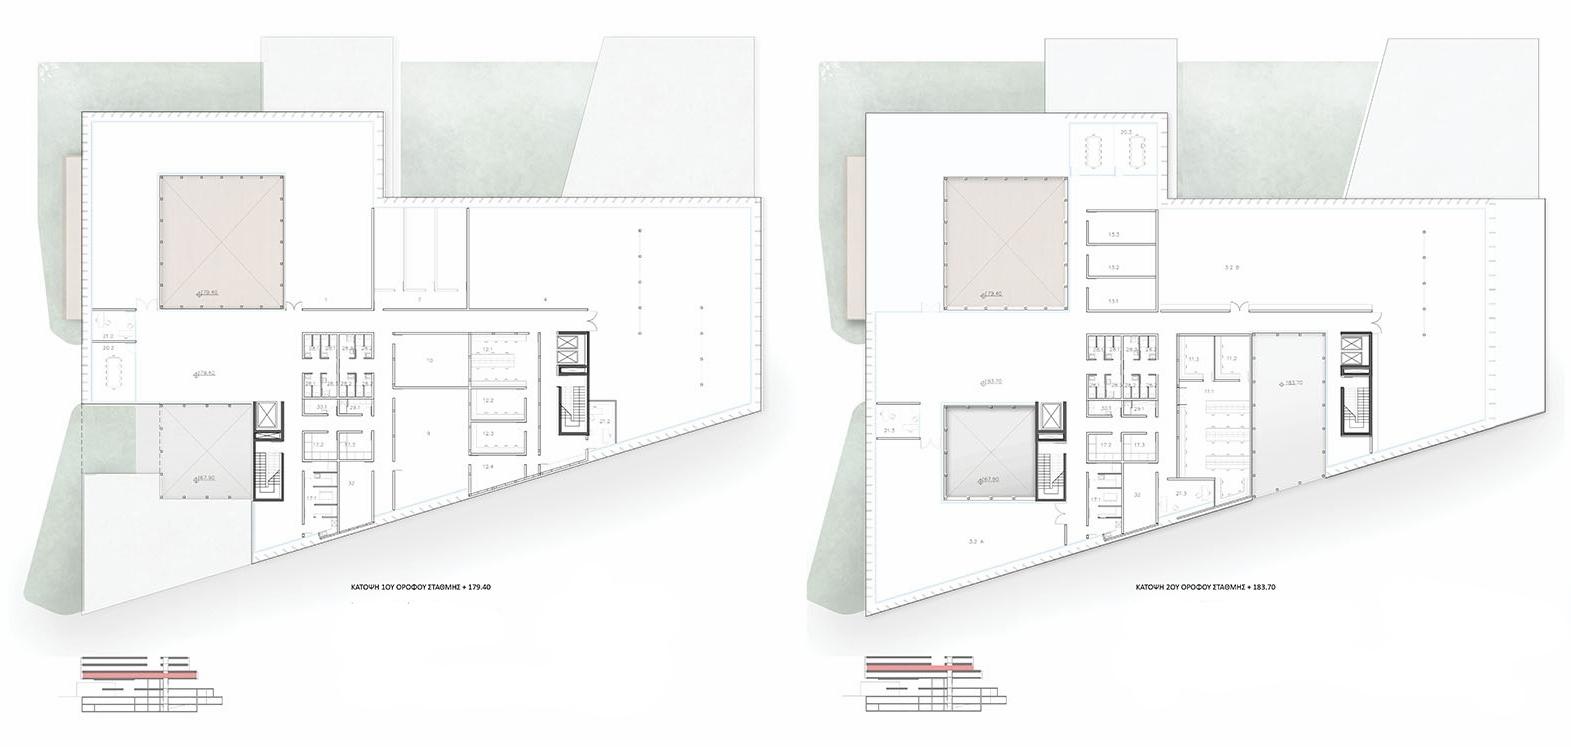 84765-panels plans 300dpi.jpg